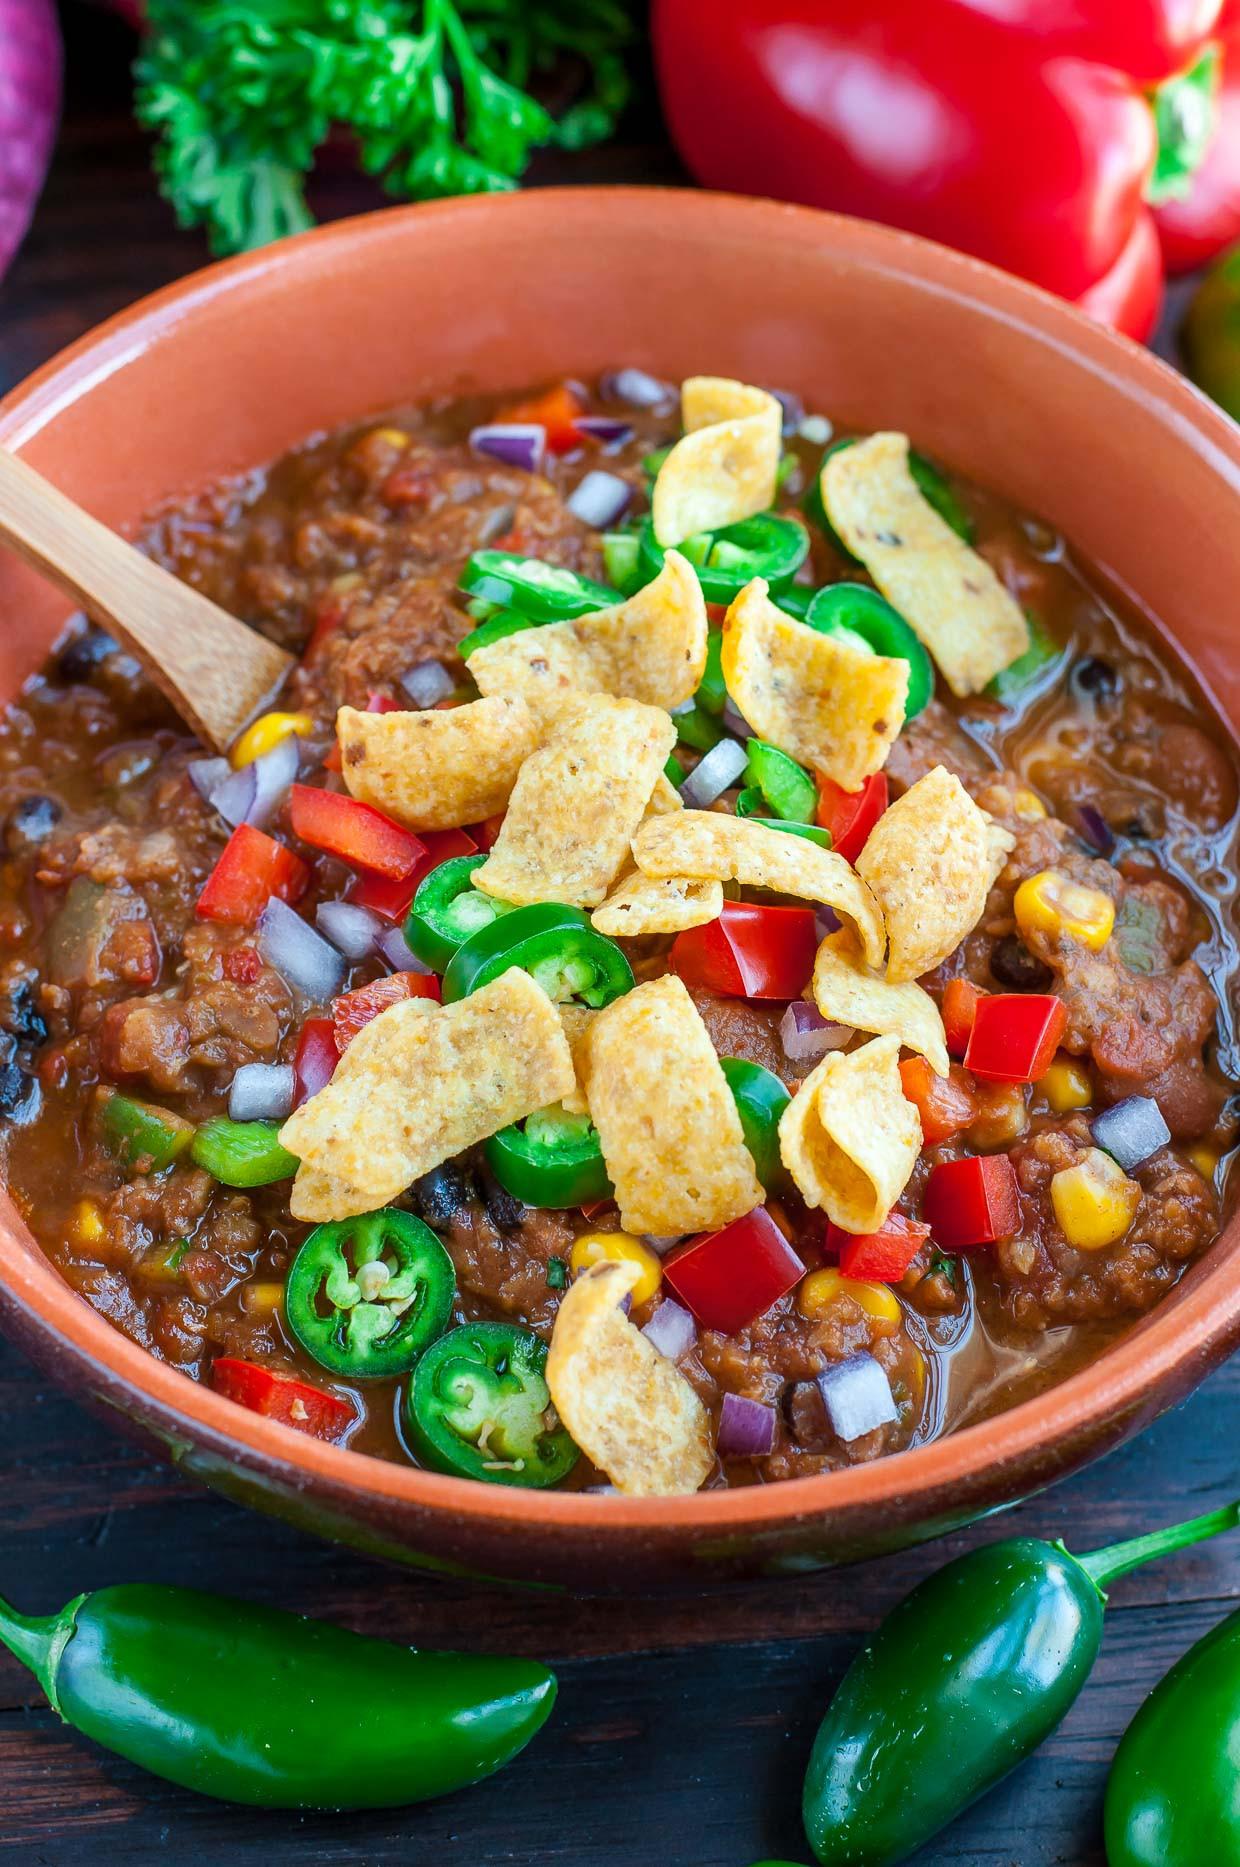 Healthy Lentil Recipes  Vegan Lentil Chili Peas And Crayons